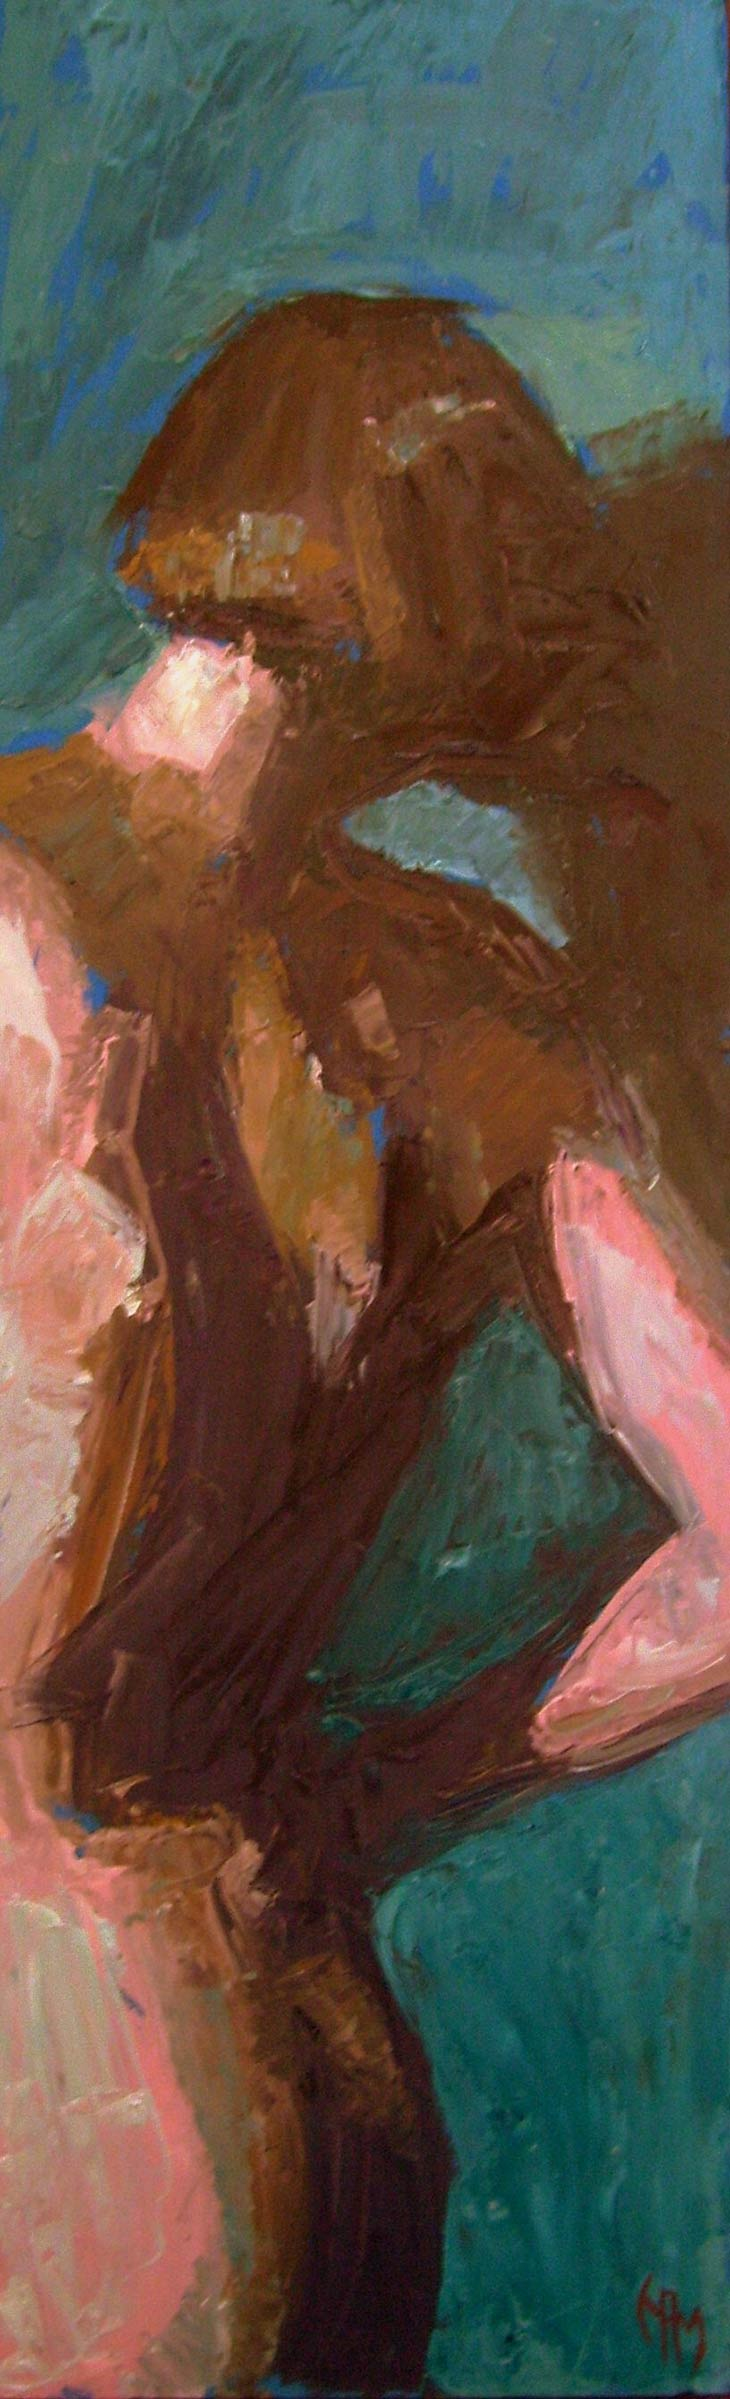 Espalda II - Red Arte